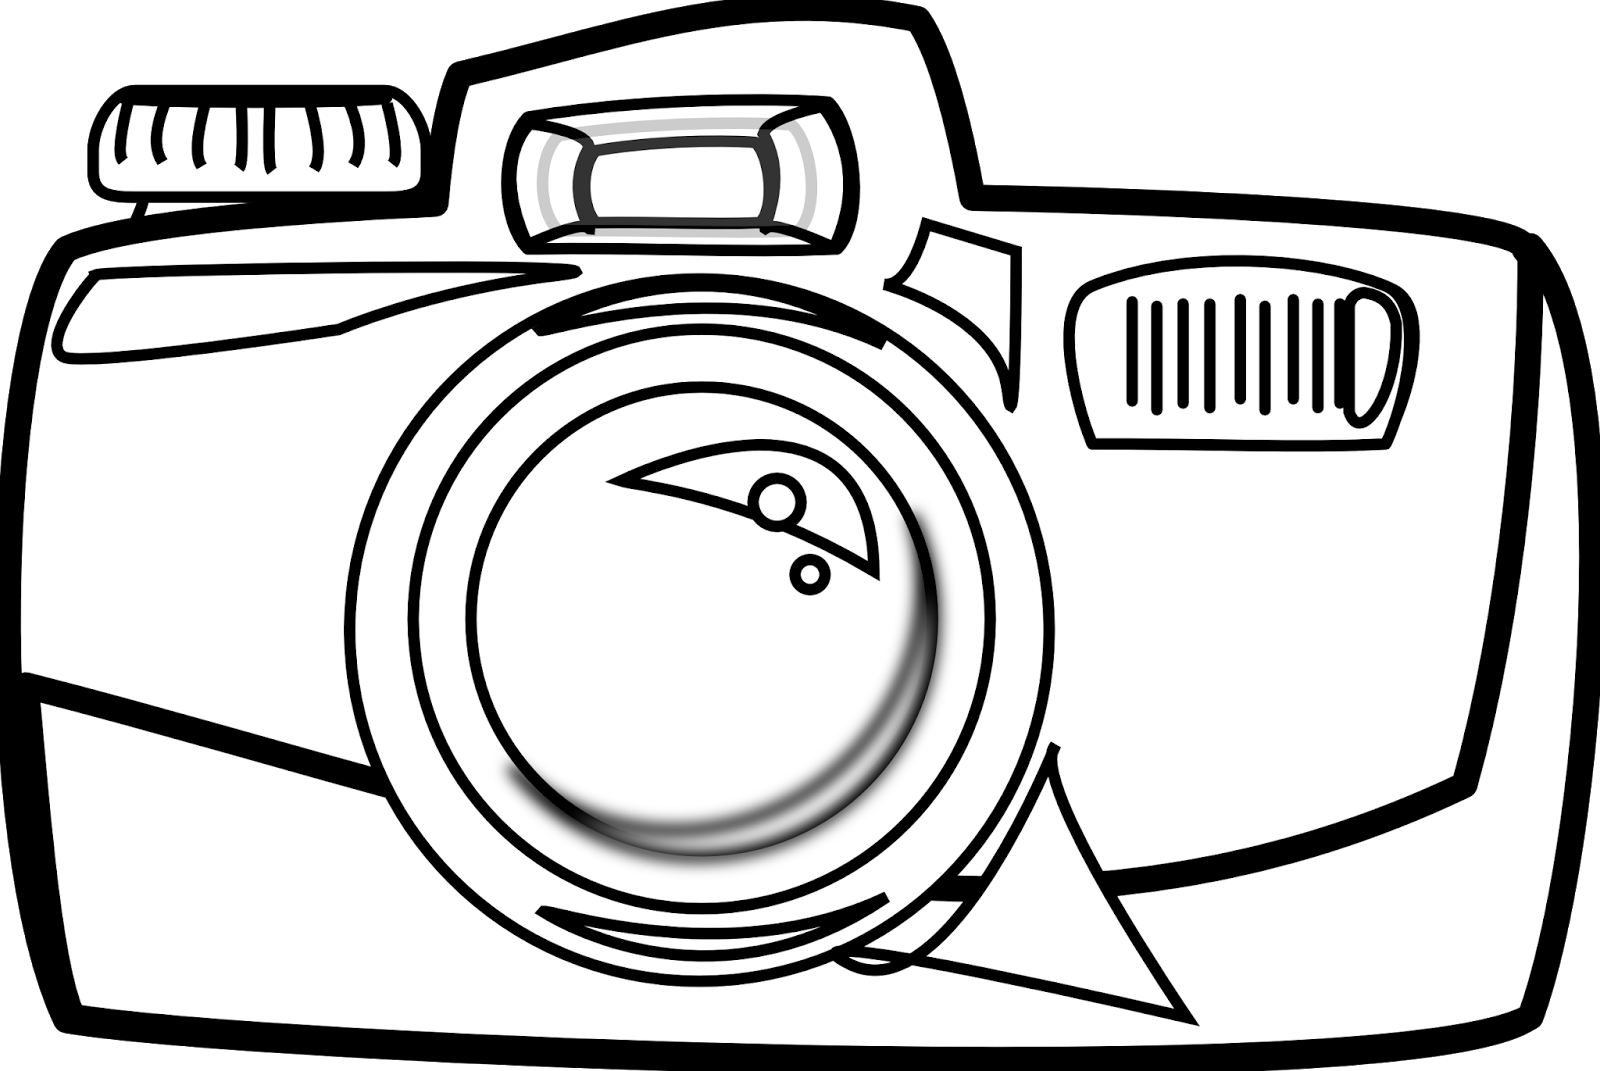 Cartoon drawing at getdrawings. Clipart camera tourist